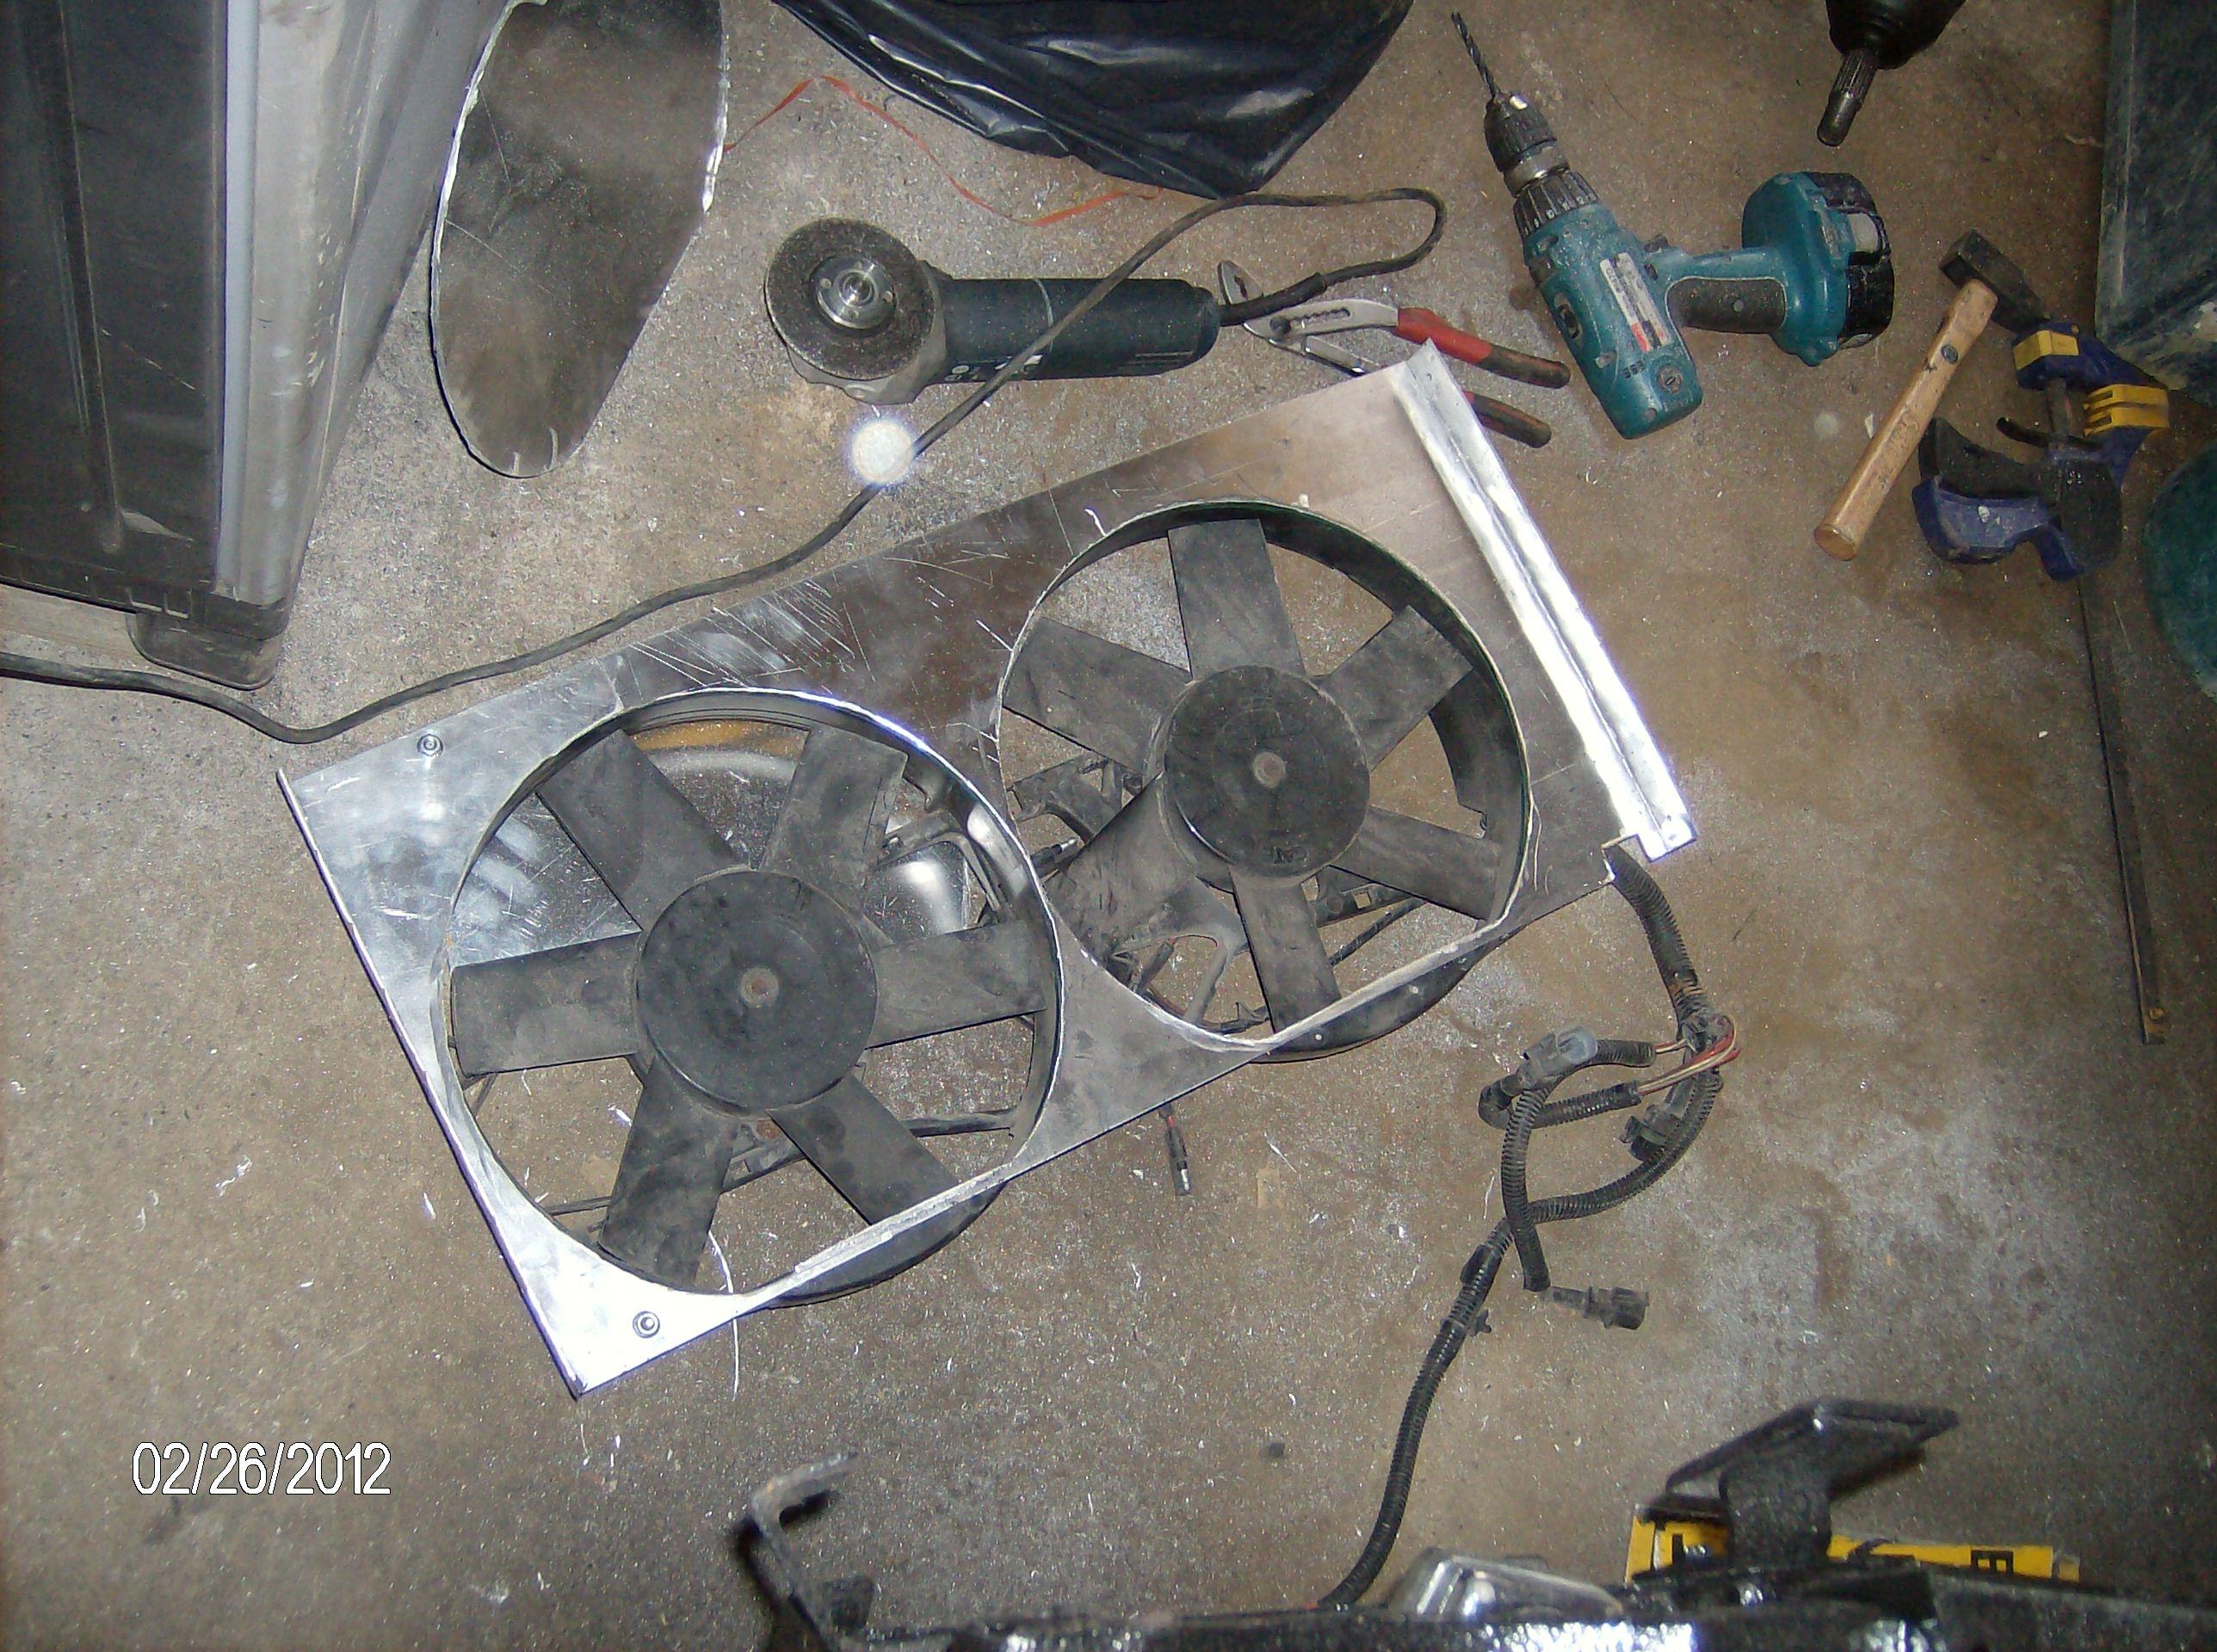 Replique renault 5 turbo - Page 6 795695HPIM2268